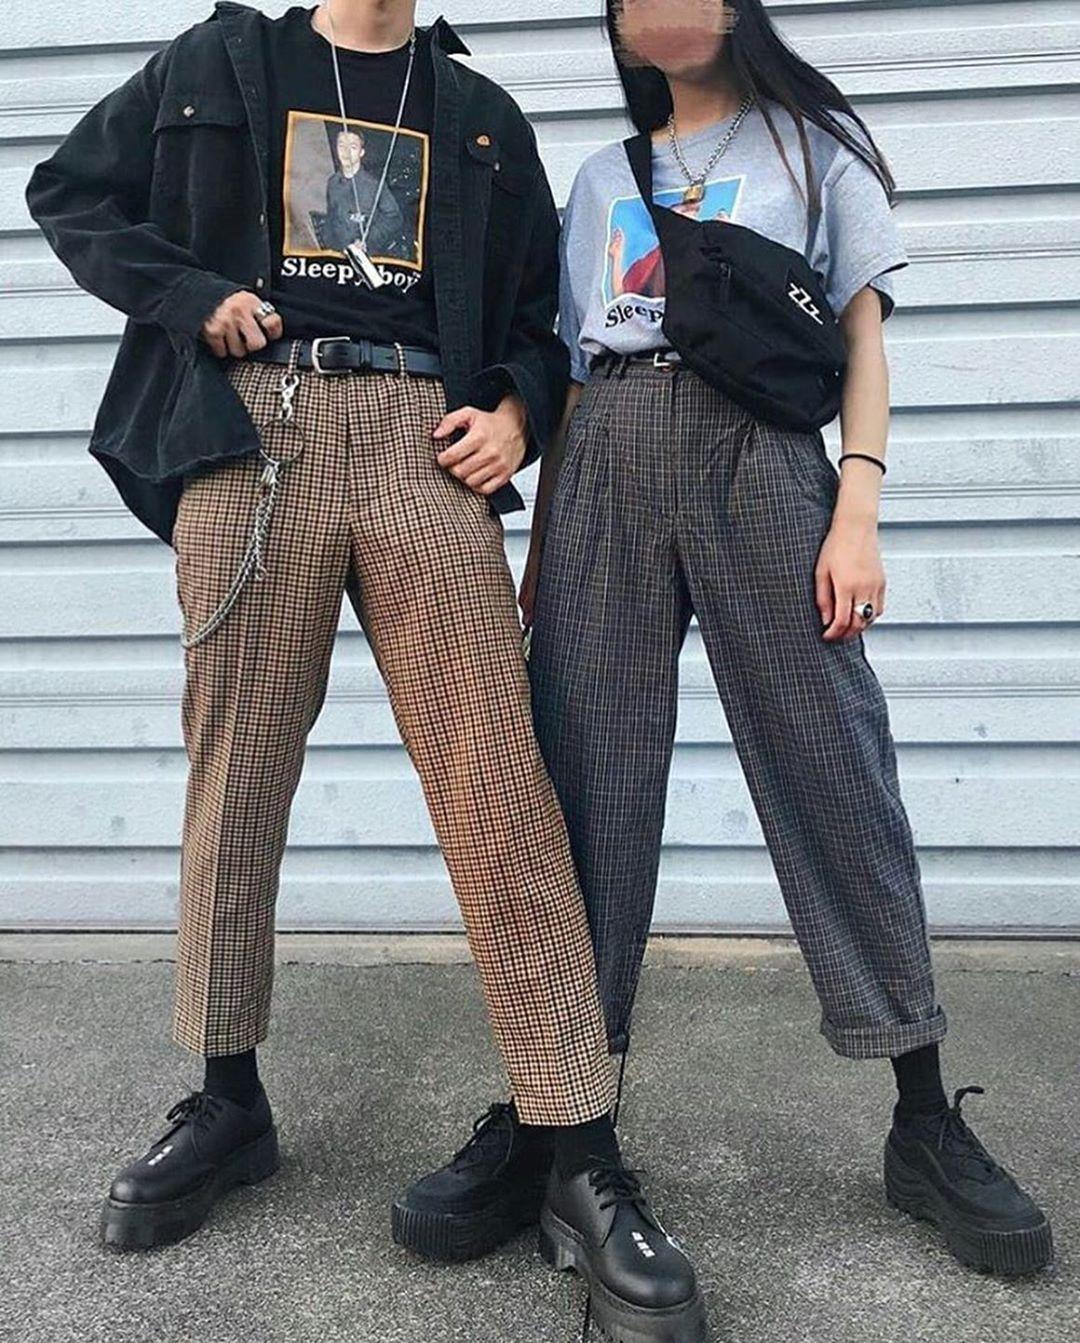 Couples Fit 1 2 Or 3 Dd A A A A Streetwear Streetstyle Fashion Style Streetfashion Hypeb Korean Street Fashion Matching Couple Outfits Streetwear Fashion